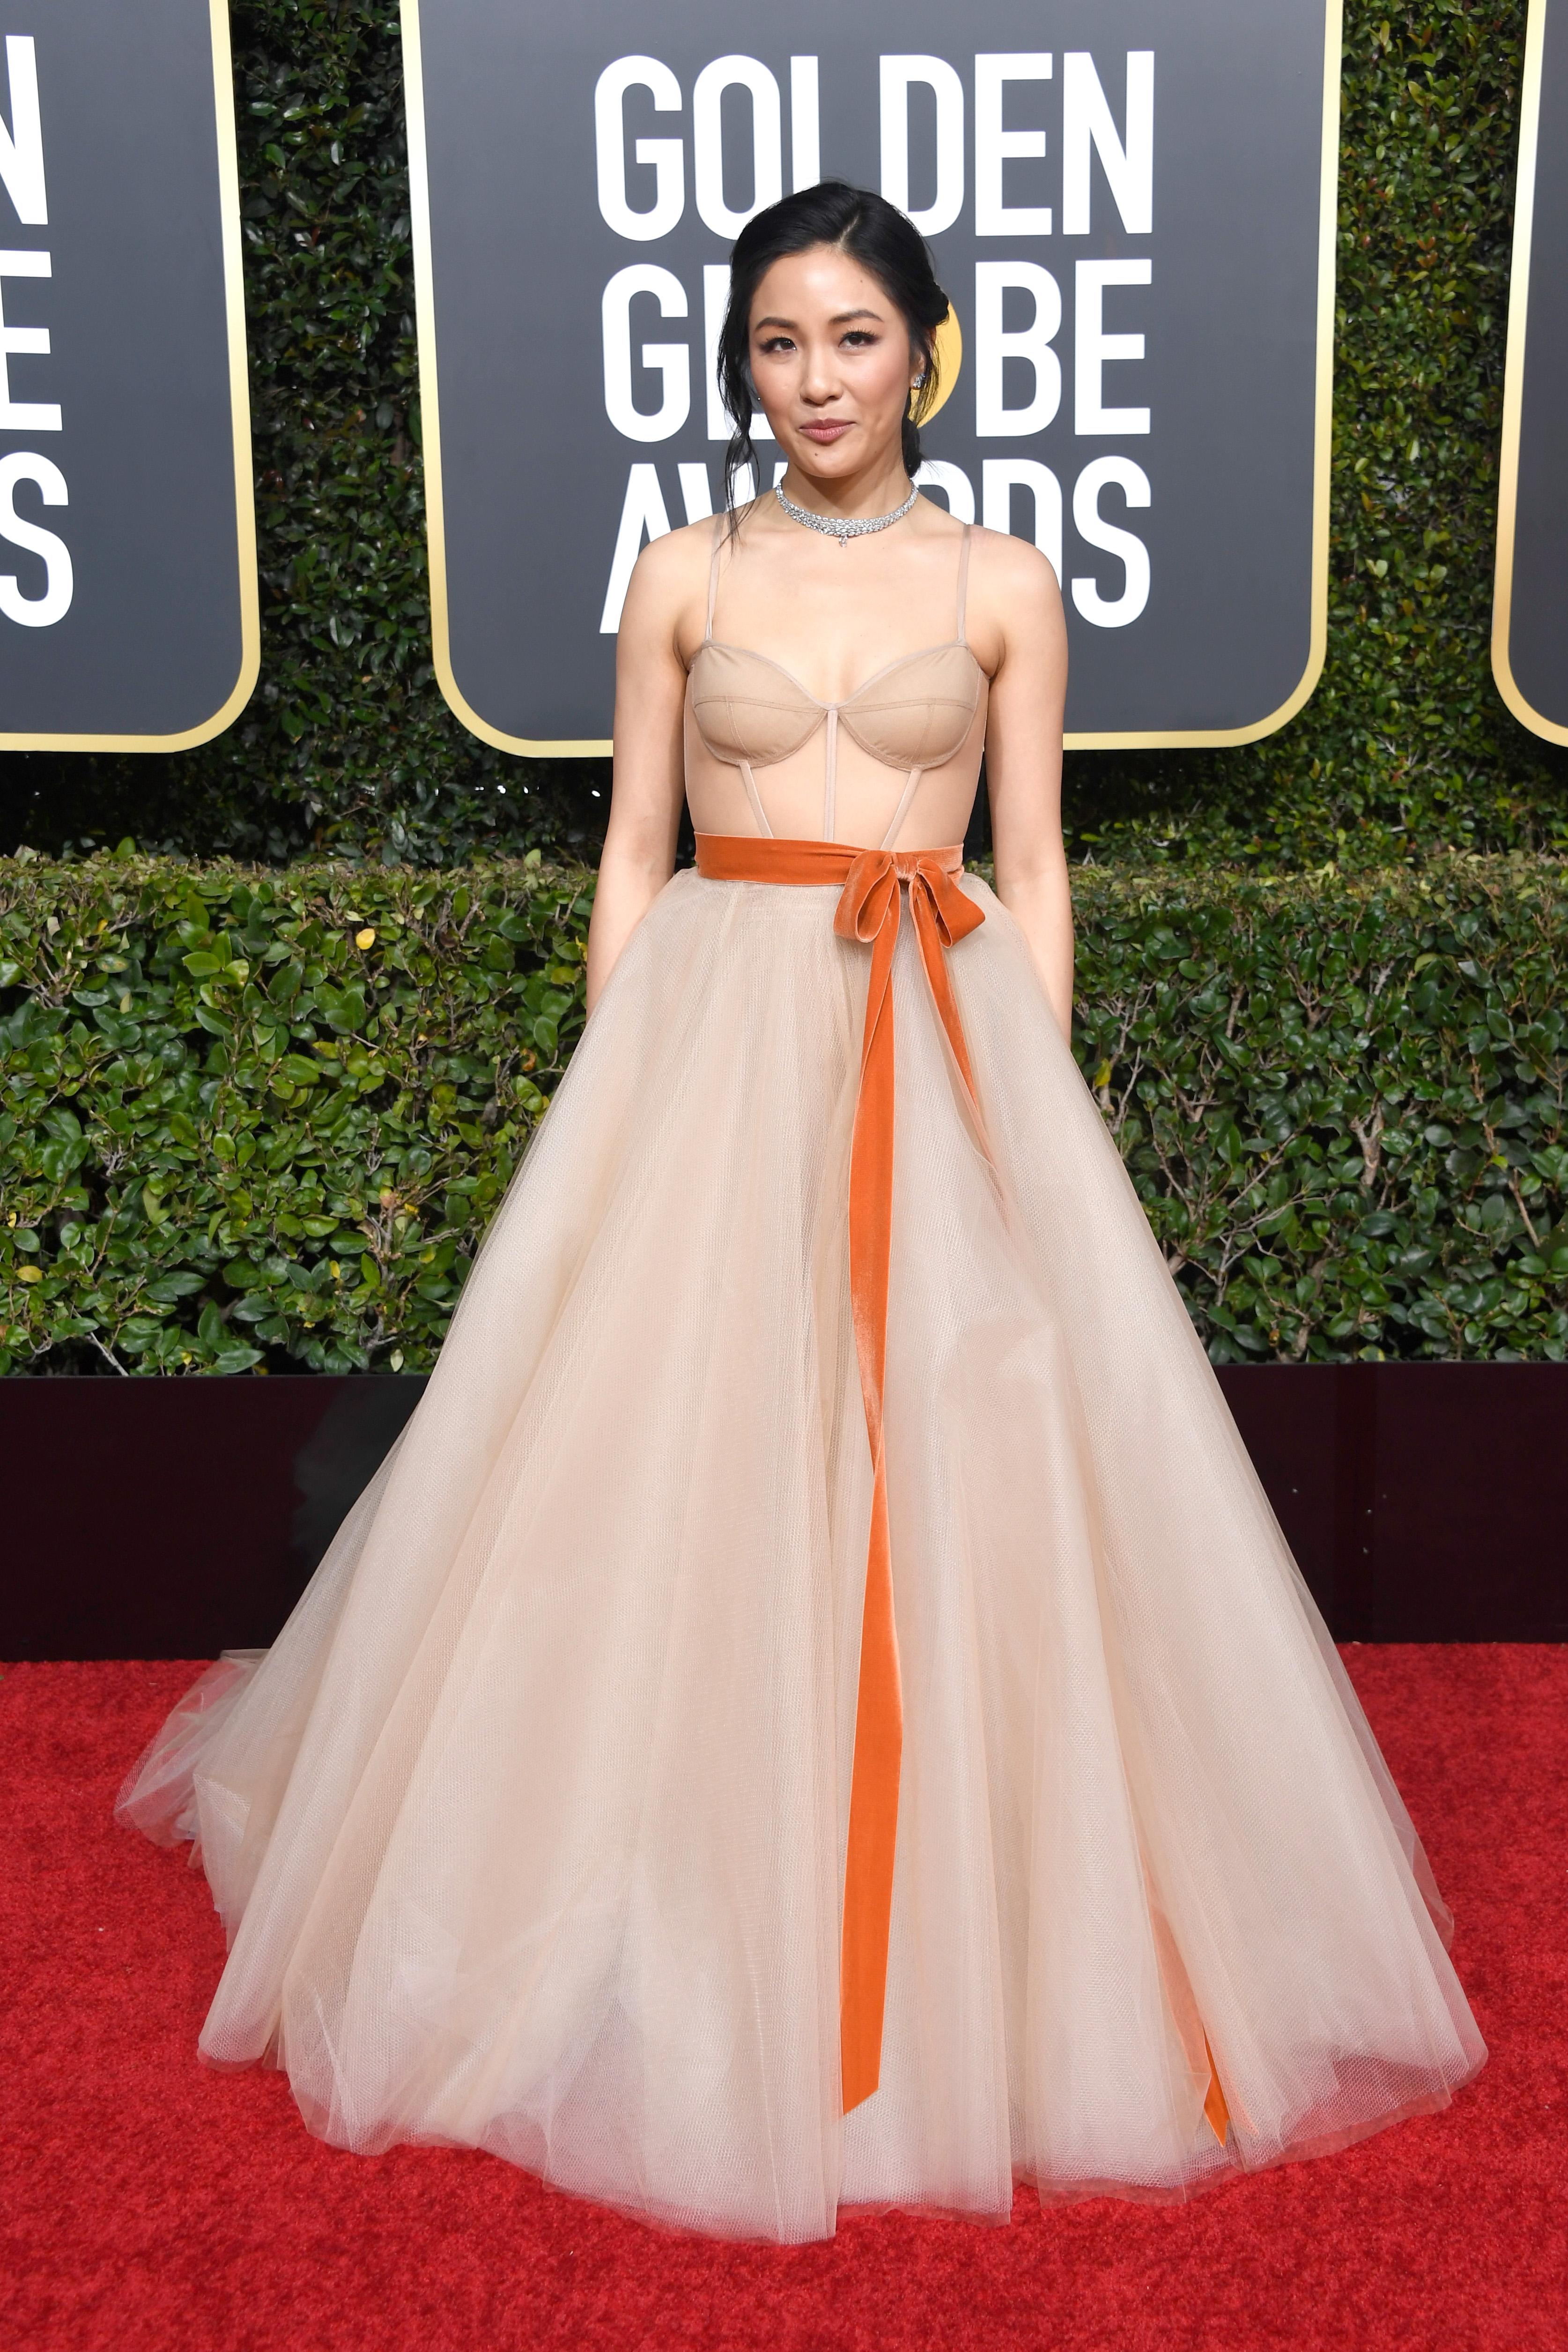 Constance Wu Stuns on 2019 Golden Globes Red Carpet